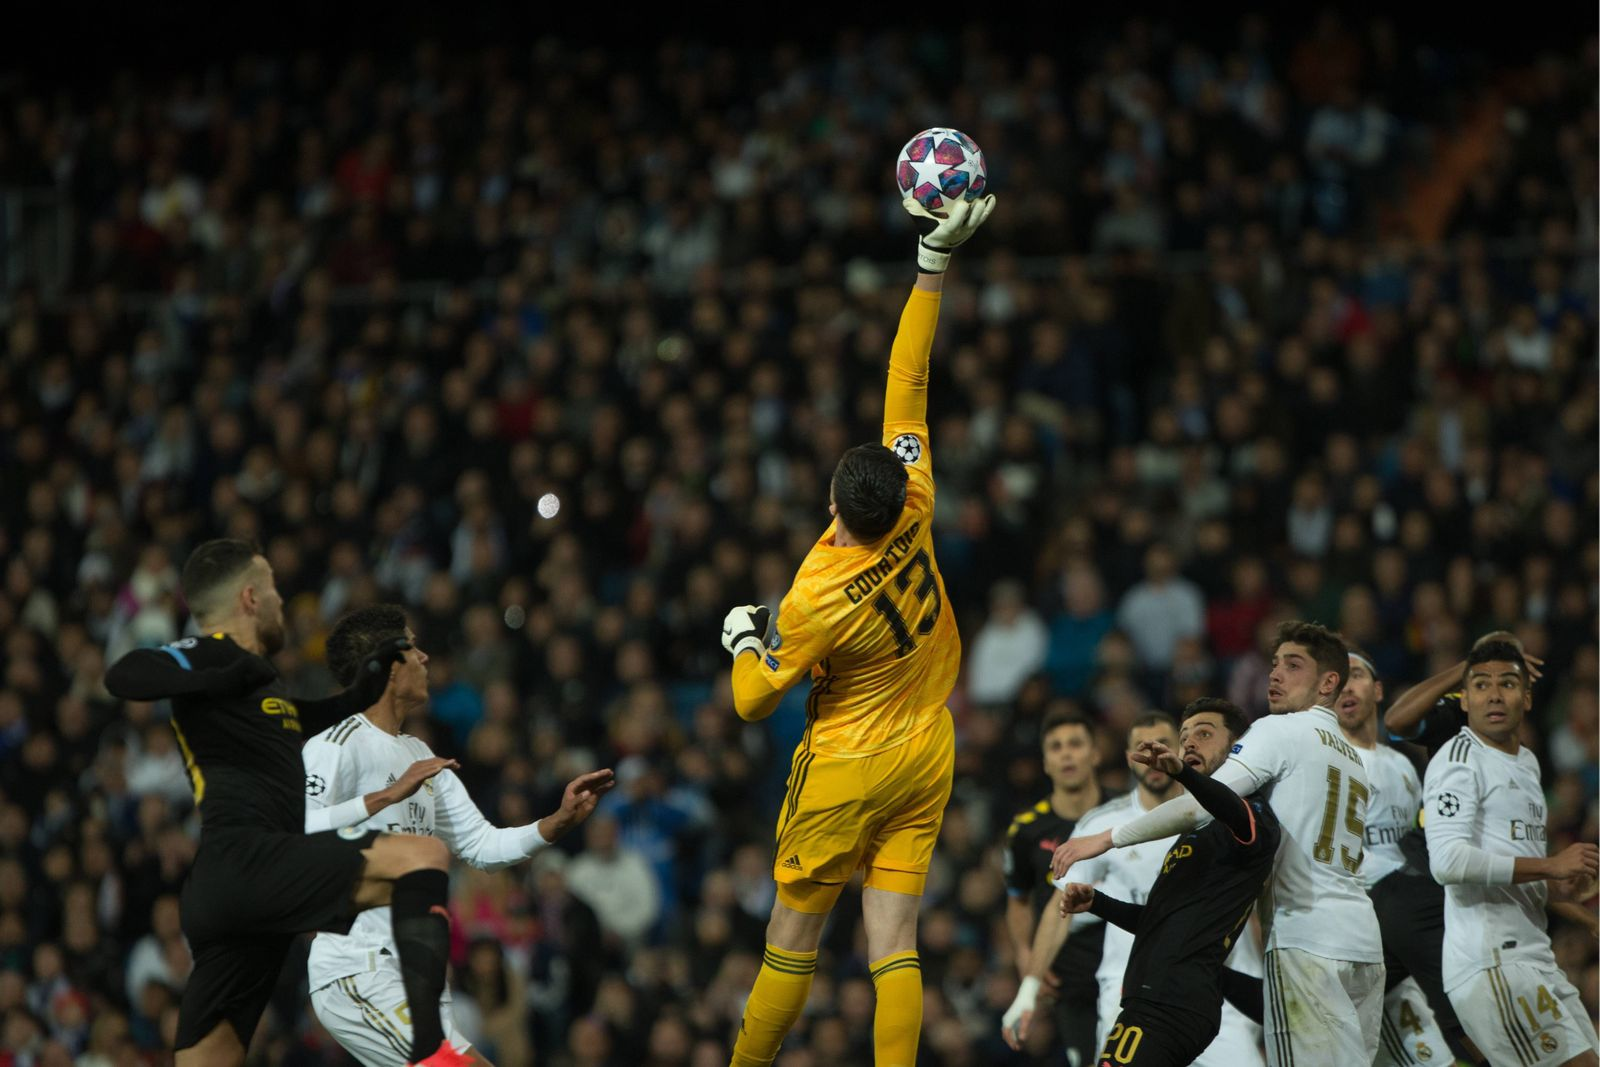 THIBAUT COURTOIS DURING MATCH REAL MADRID VERSUS MANCHESTER CITY, UEFA CHAMPIONS LEAGUE AT SANTIAGO BERNABEU STADIUM. 2